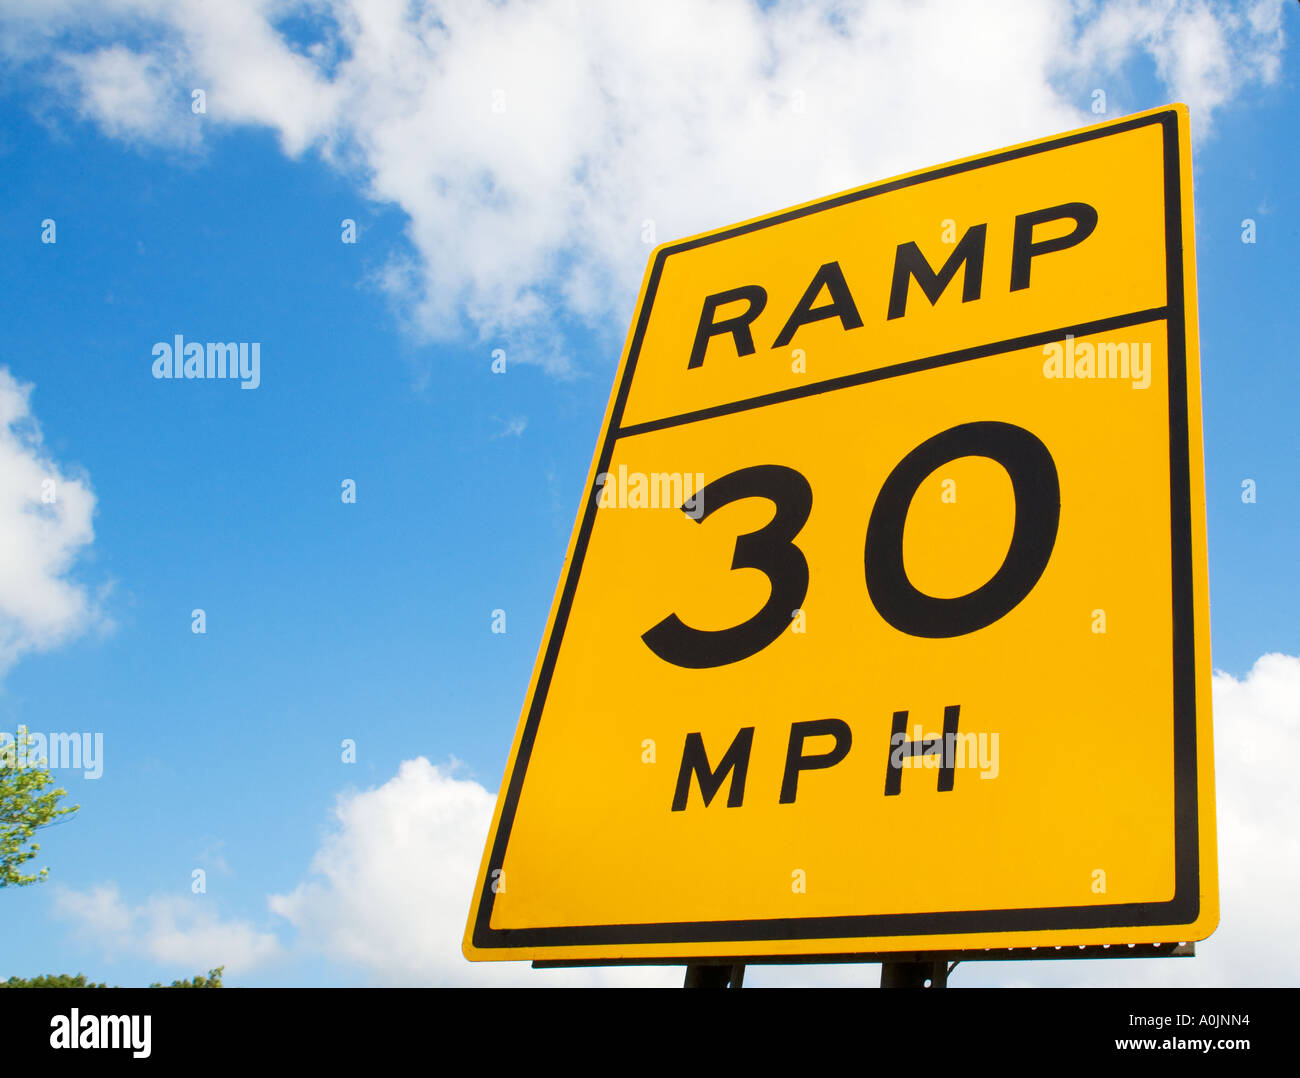 30 MPH RAMP SIGN - Stock Image